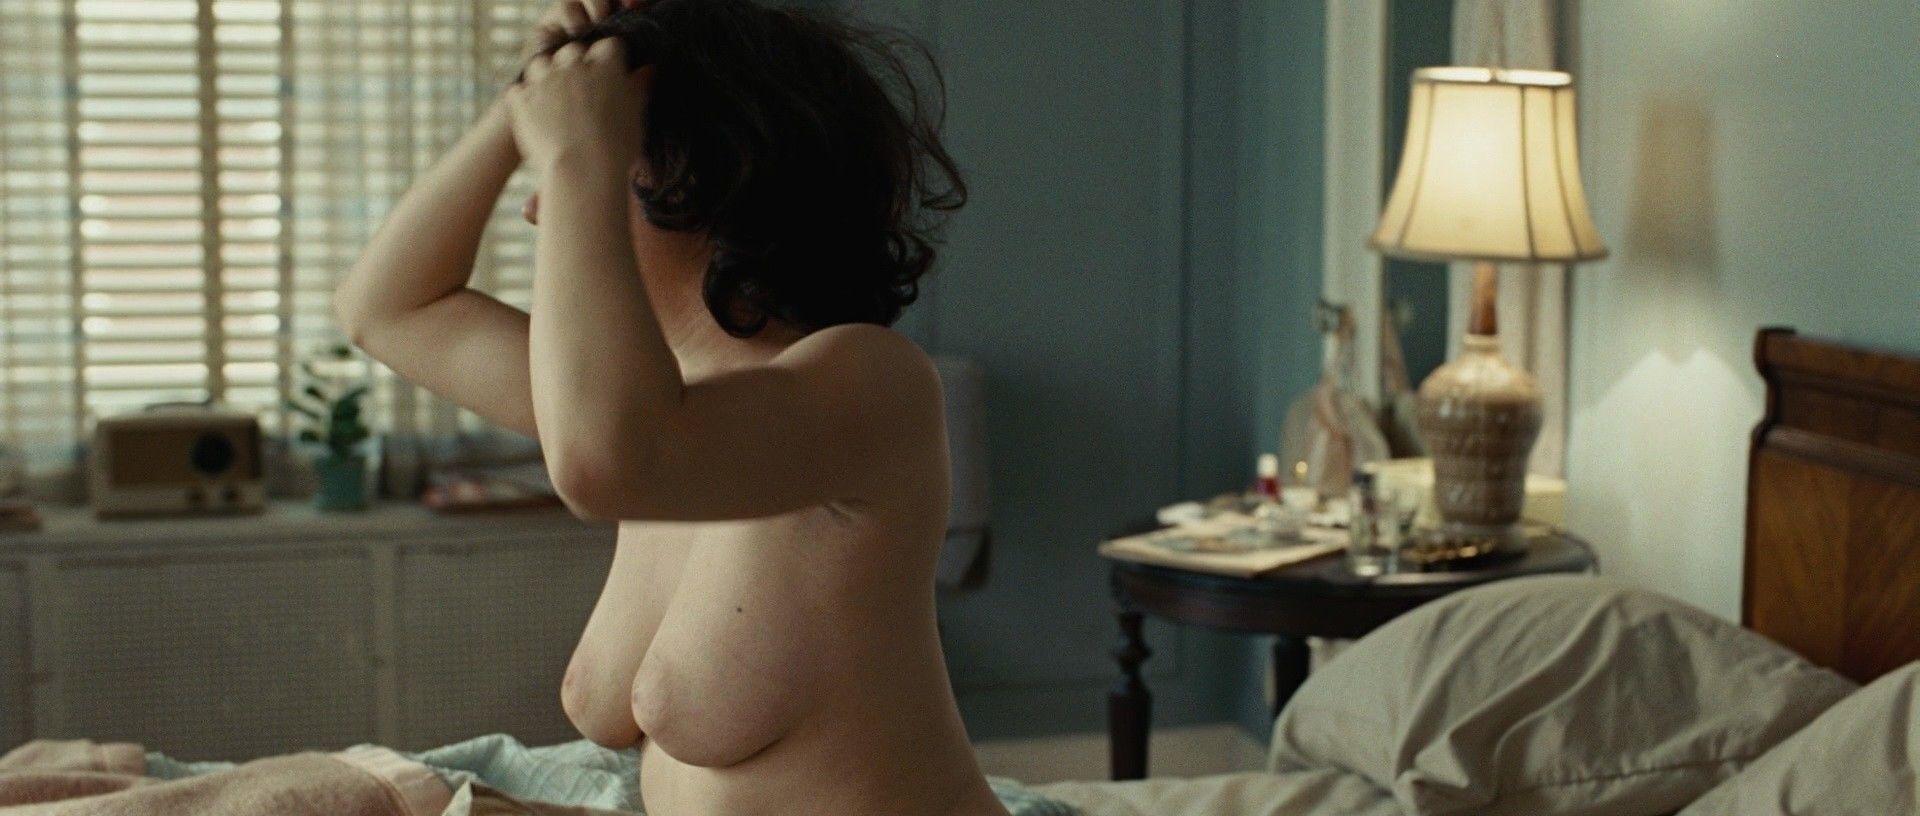 Lainie Kazan Naked In Zohan